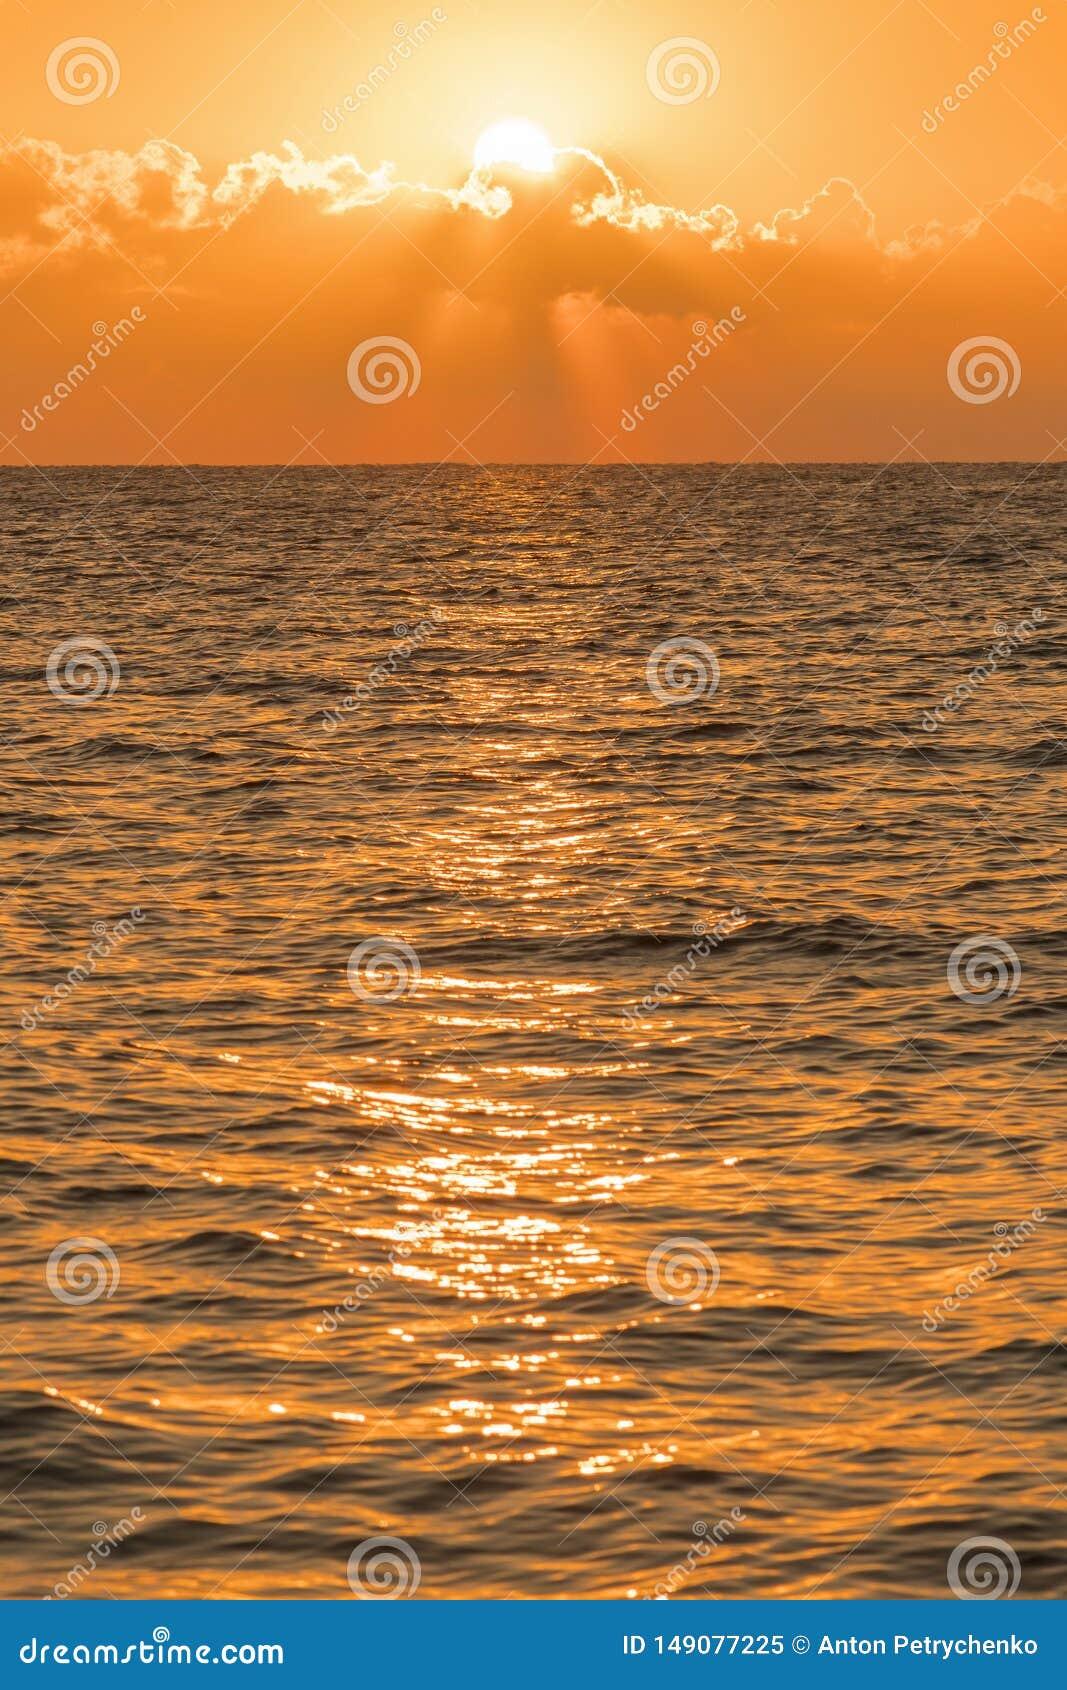 Colorful dawn over the sea, Sunset. Beautiful magic sunset over the sea. vertical photo